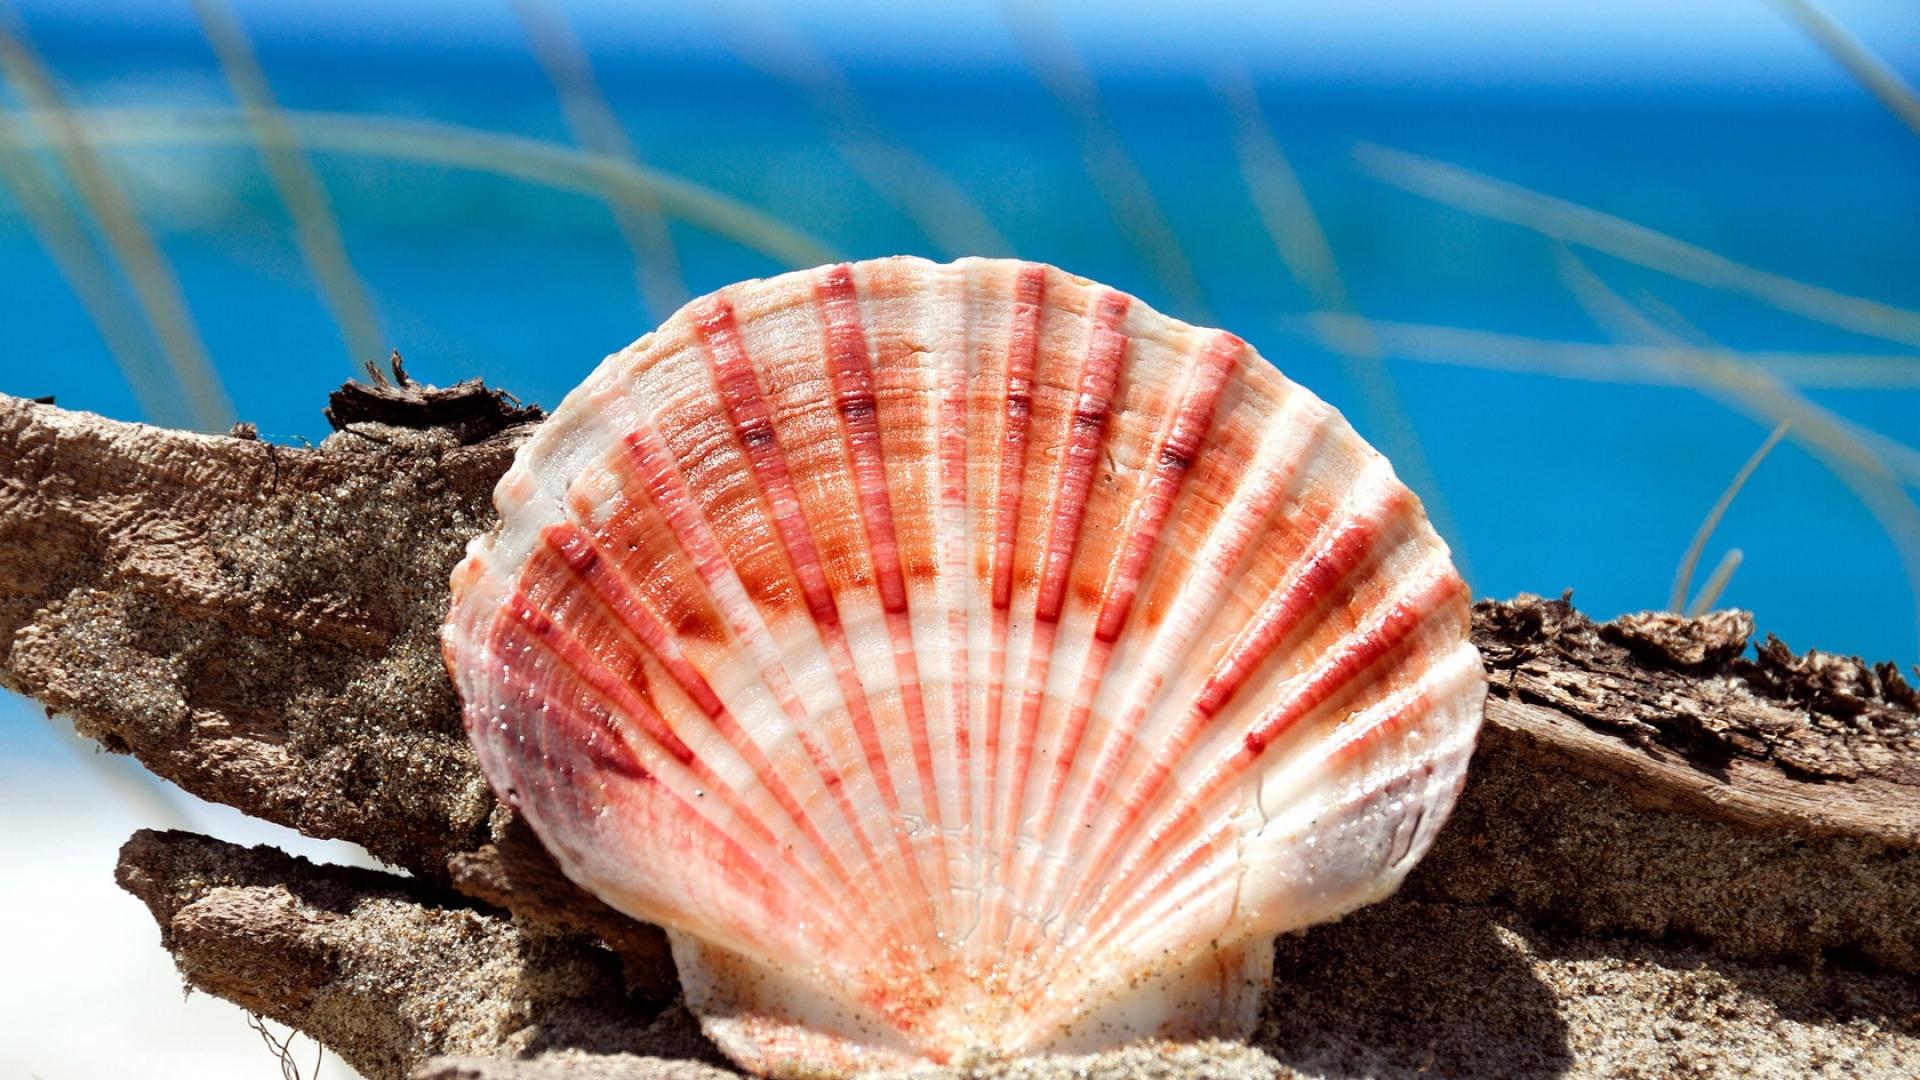 When A Snail Falls In Love Wallpaper Download Wallpaper 1920x1080 Shell Sea Stones Form Full